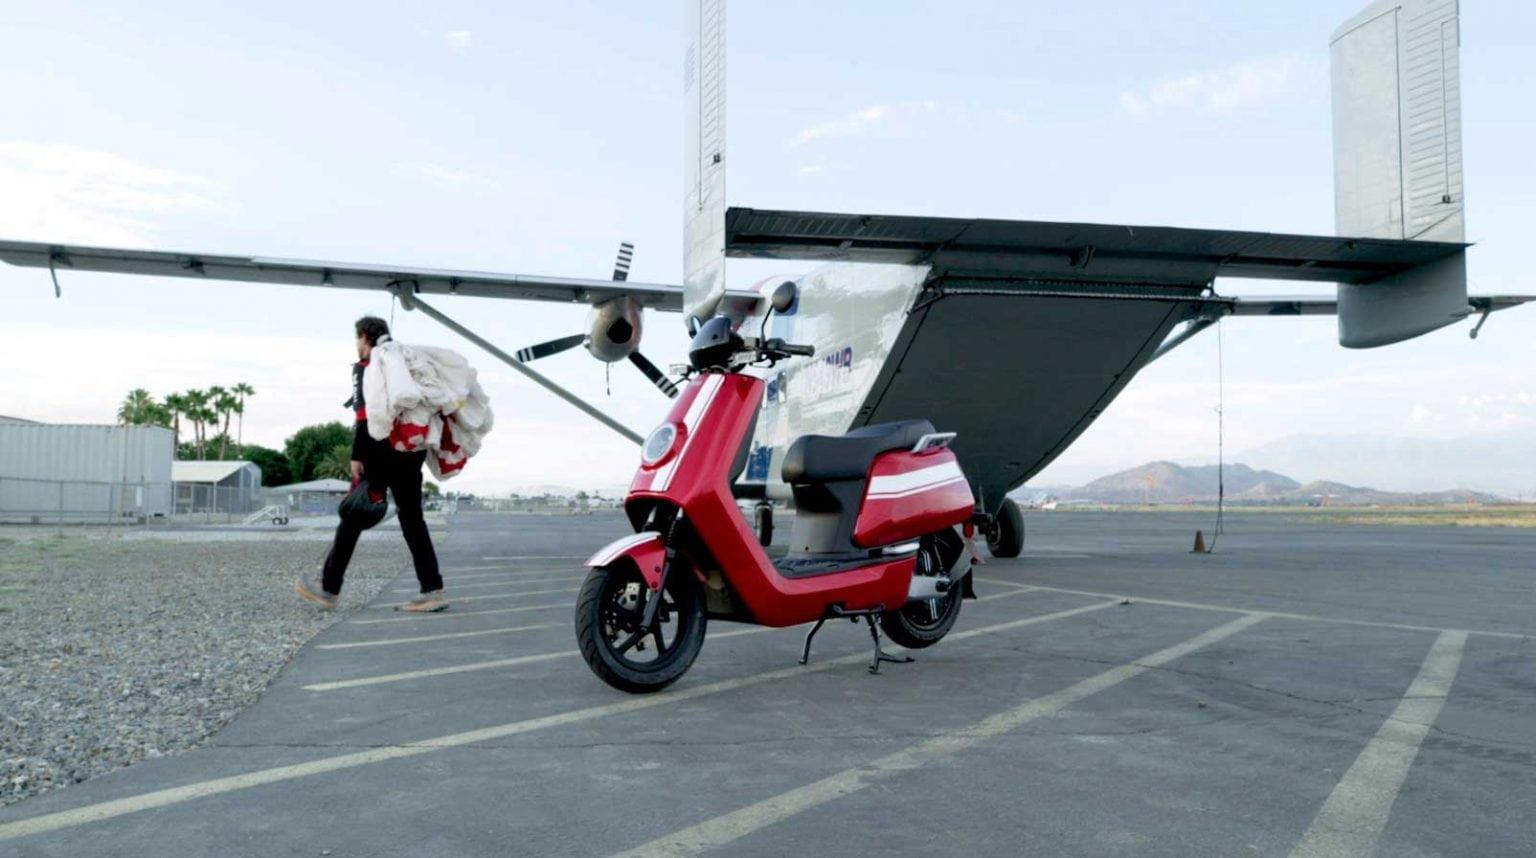 Skydive Stunt Park OPT 1536x858 1